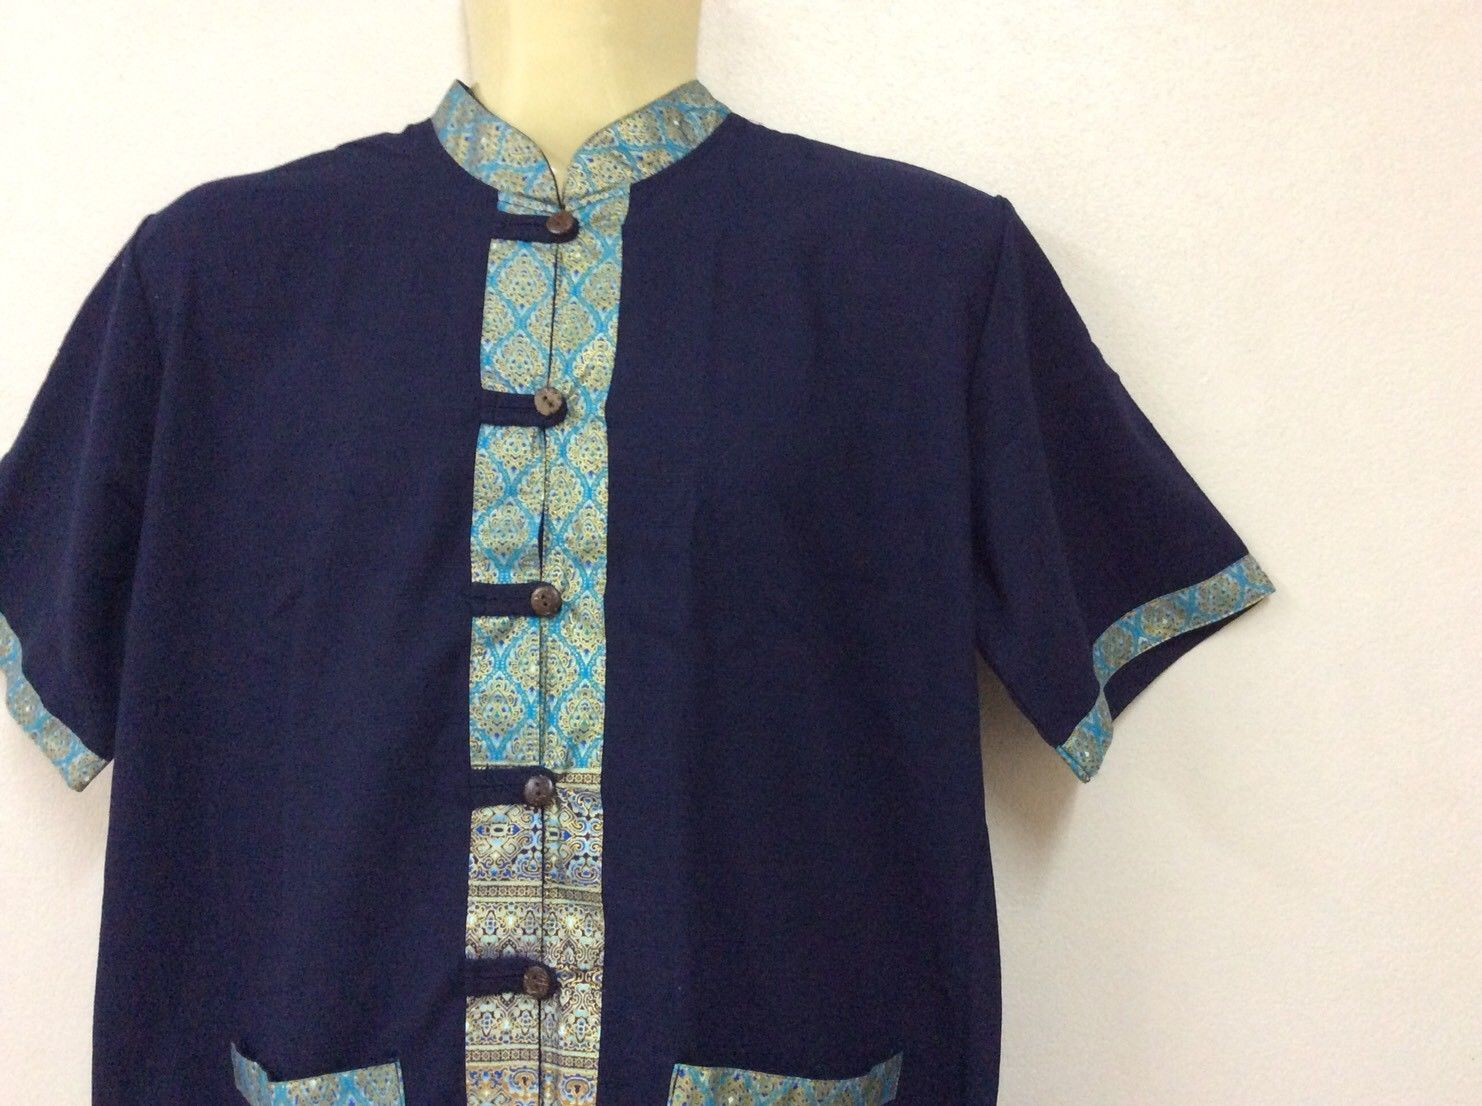 MEN Thai Traditional MANDARIN Collar Shirt Chinese Spa Short Sleeve Navy Blue XL